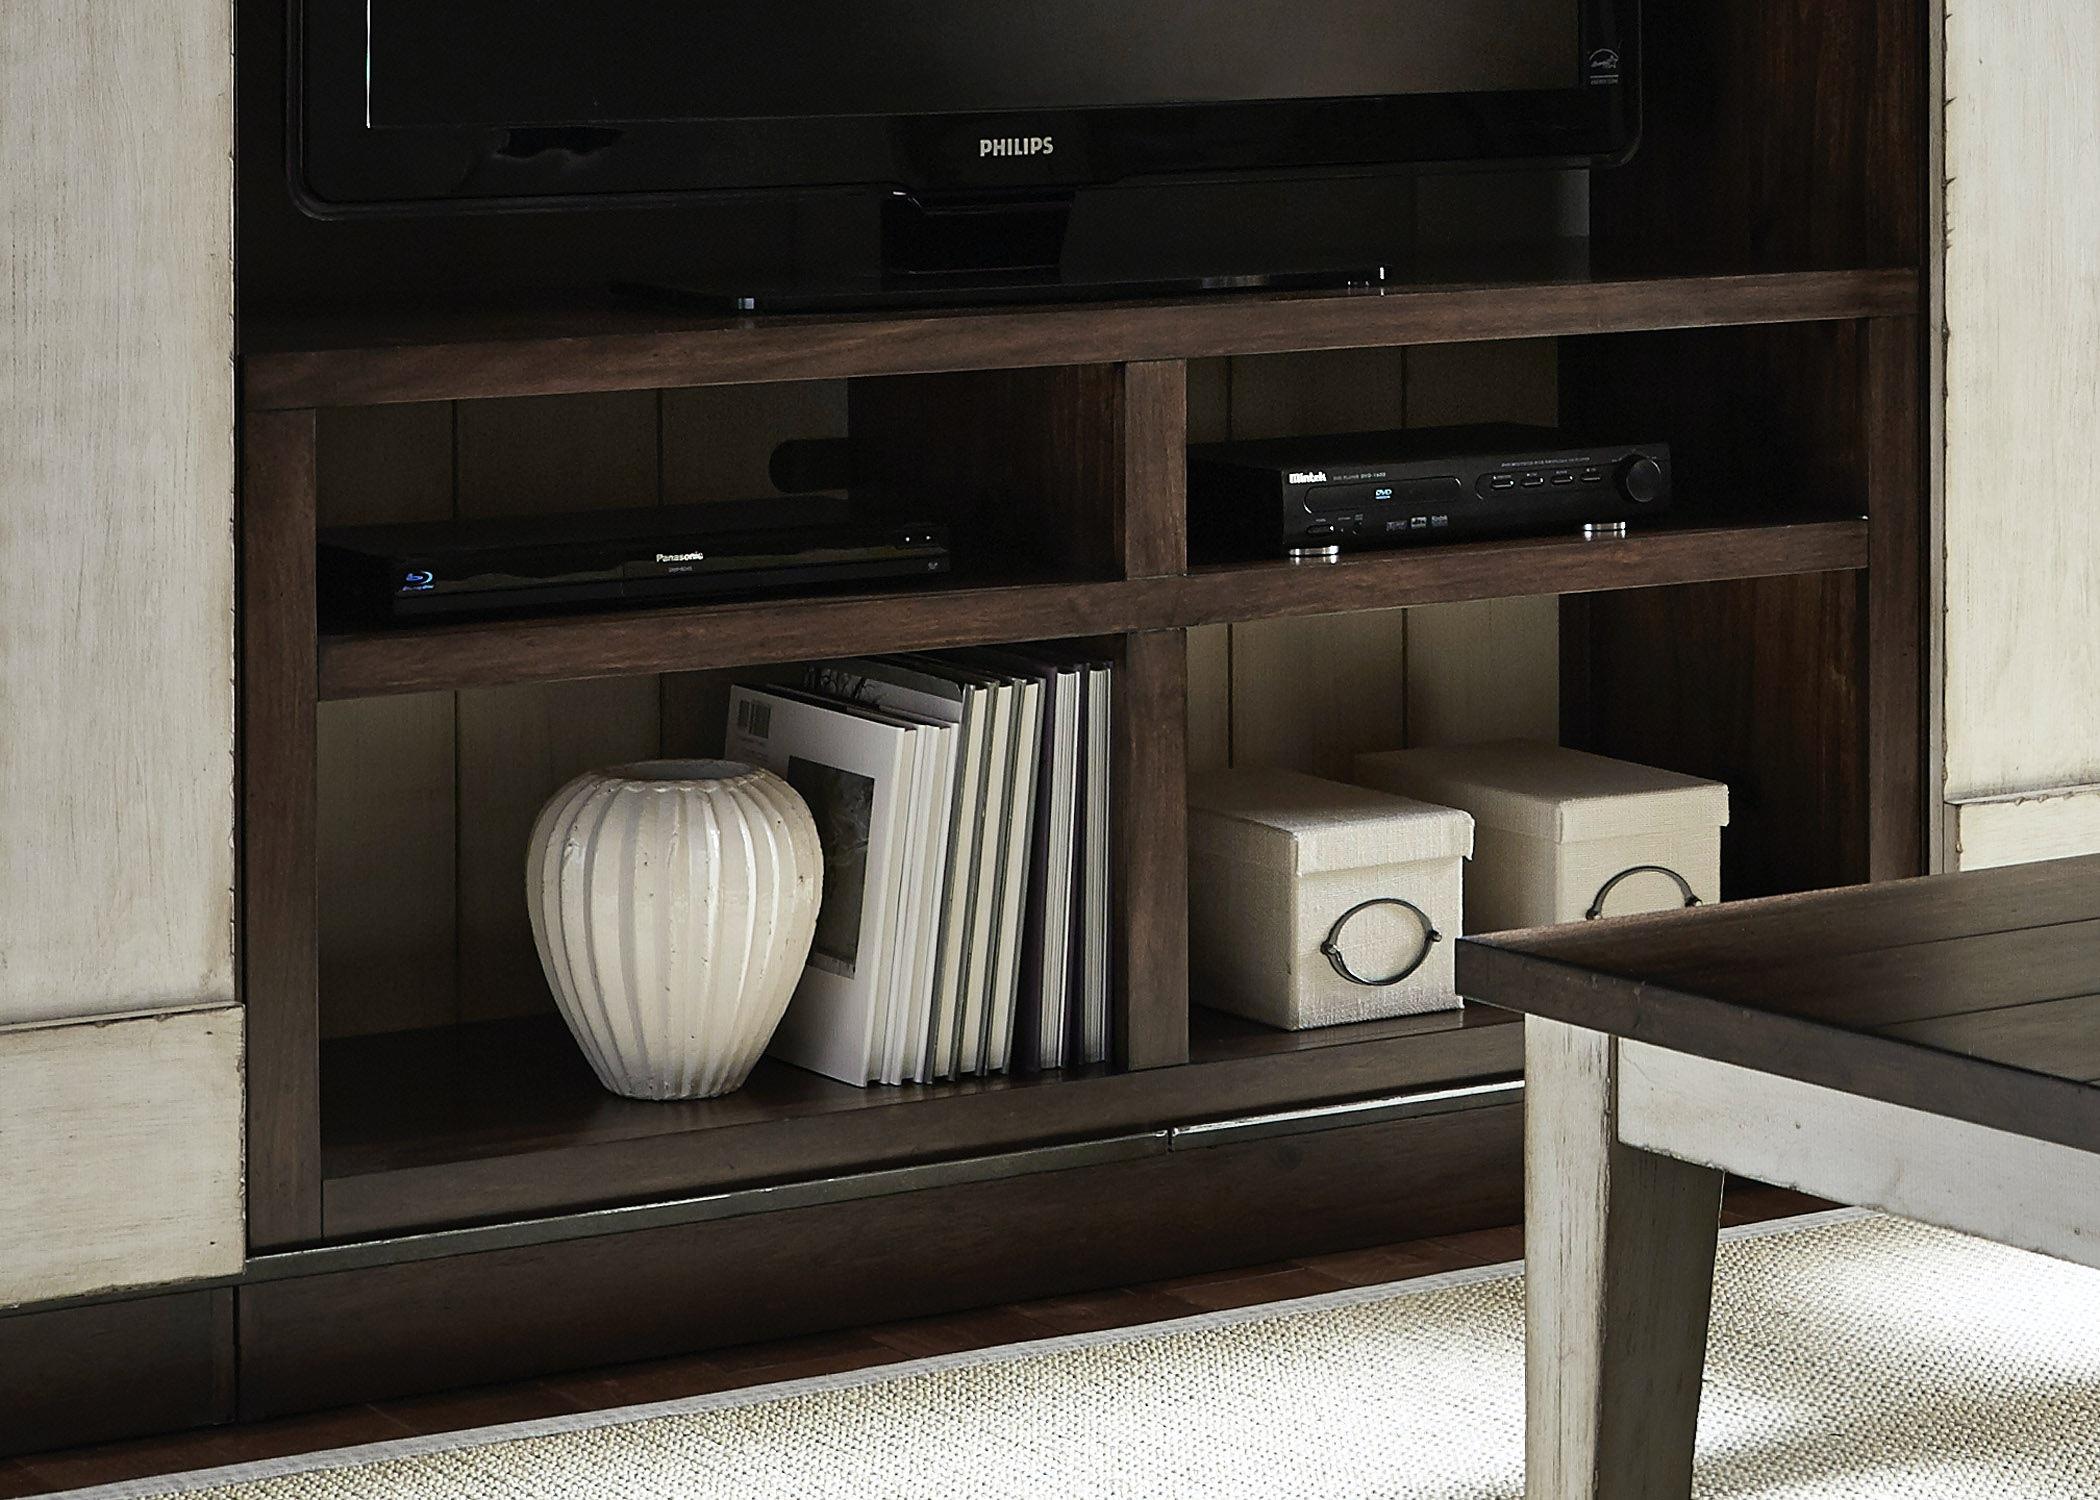 Superb Liberty Furniture Home Entertainment Entertainment TV Stand 612 TV55   Kiser  Furniture   Abingdon, VA